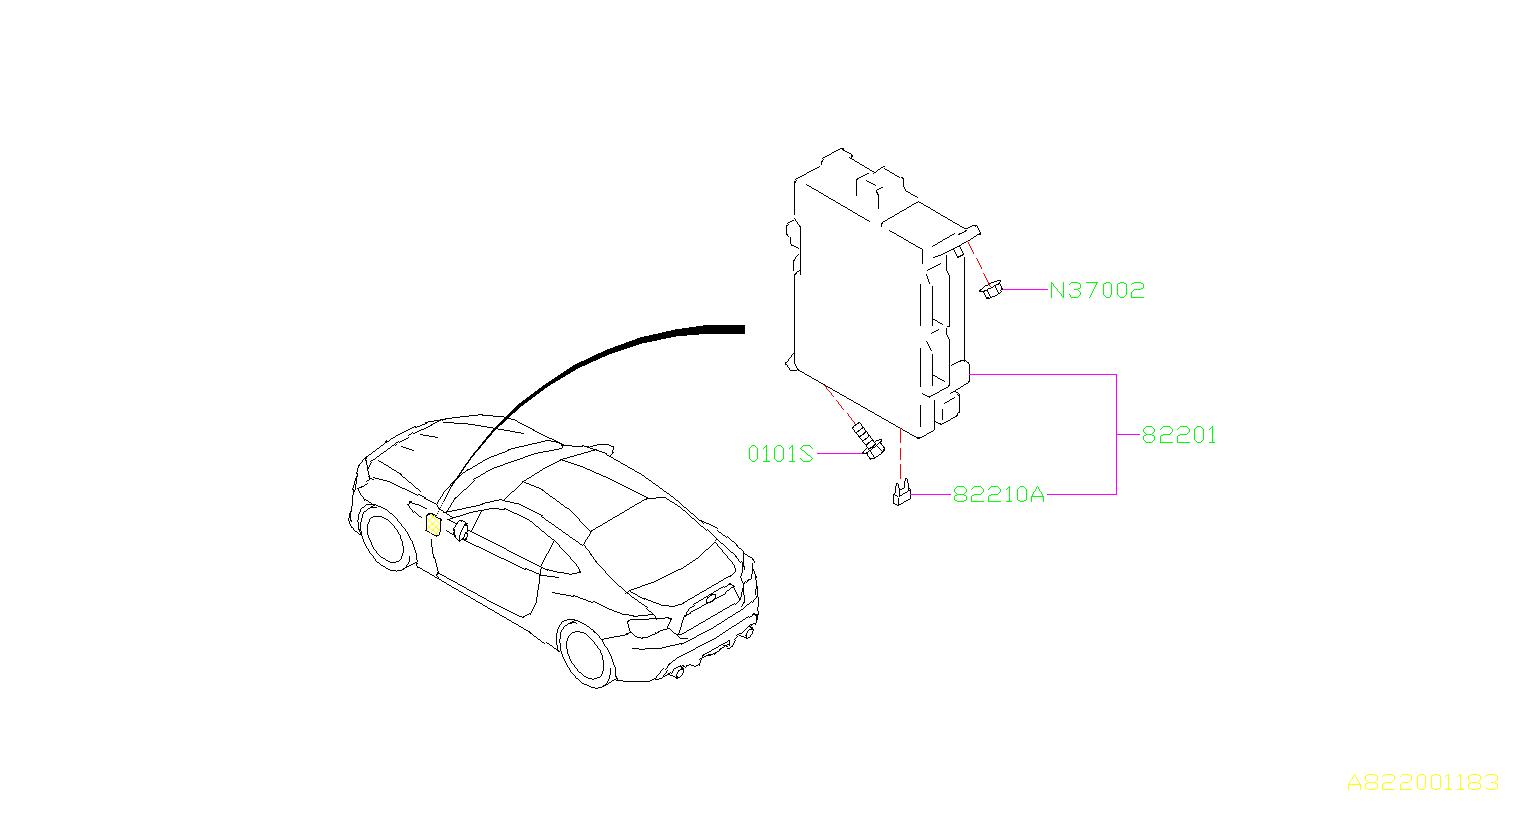 Subaru Brz Wiring Diagram